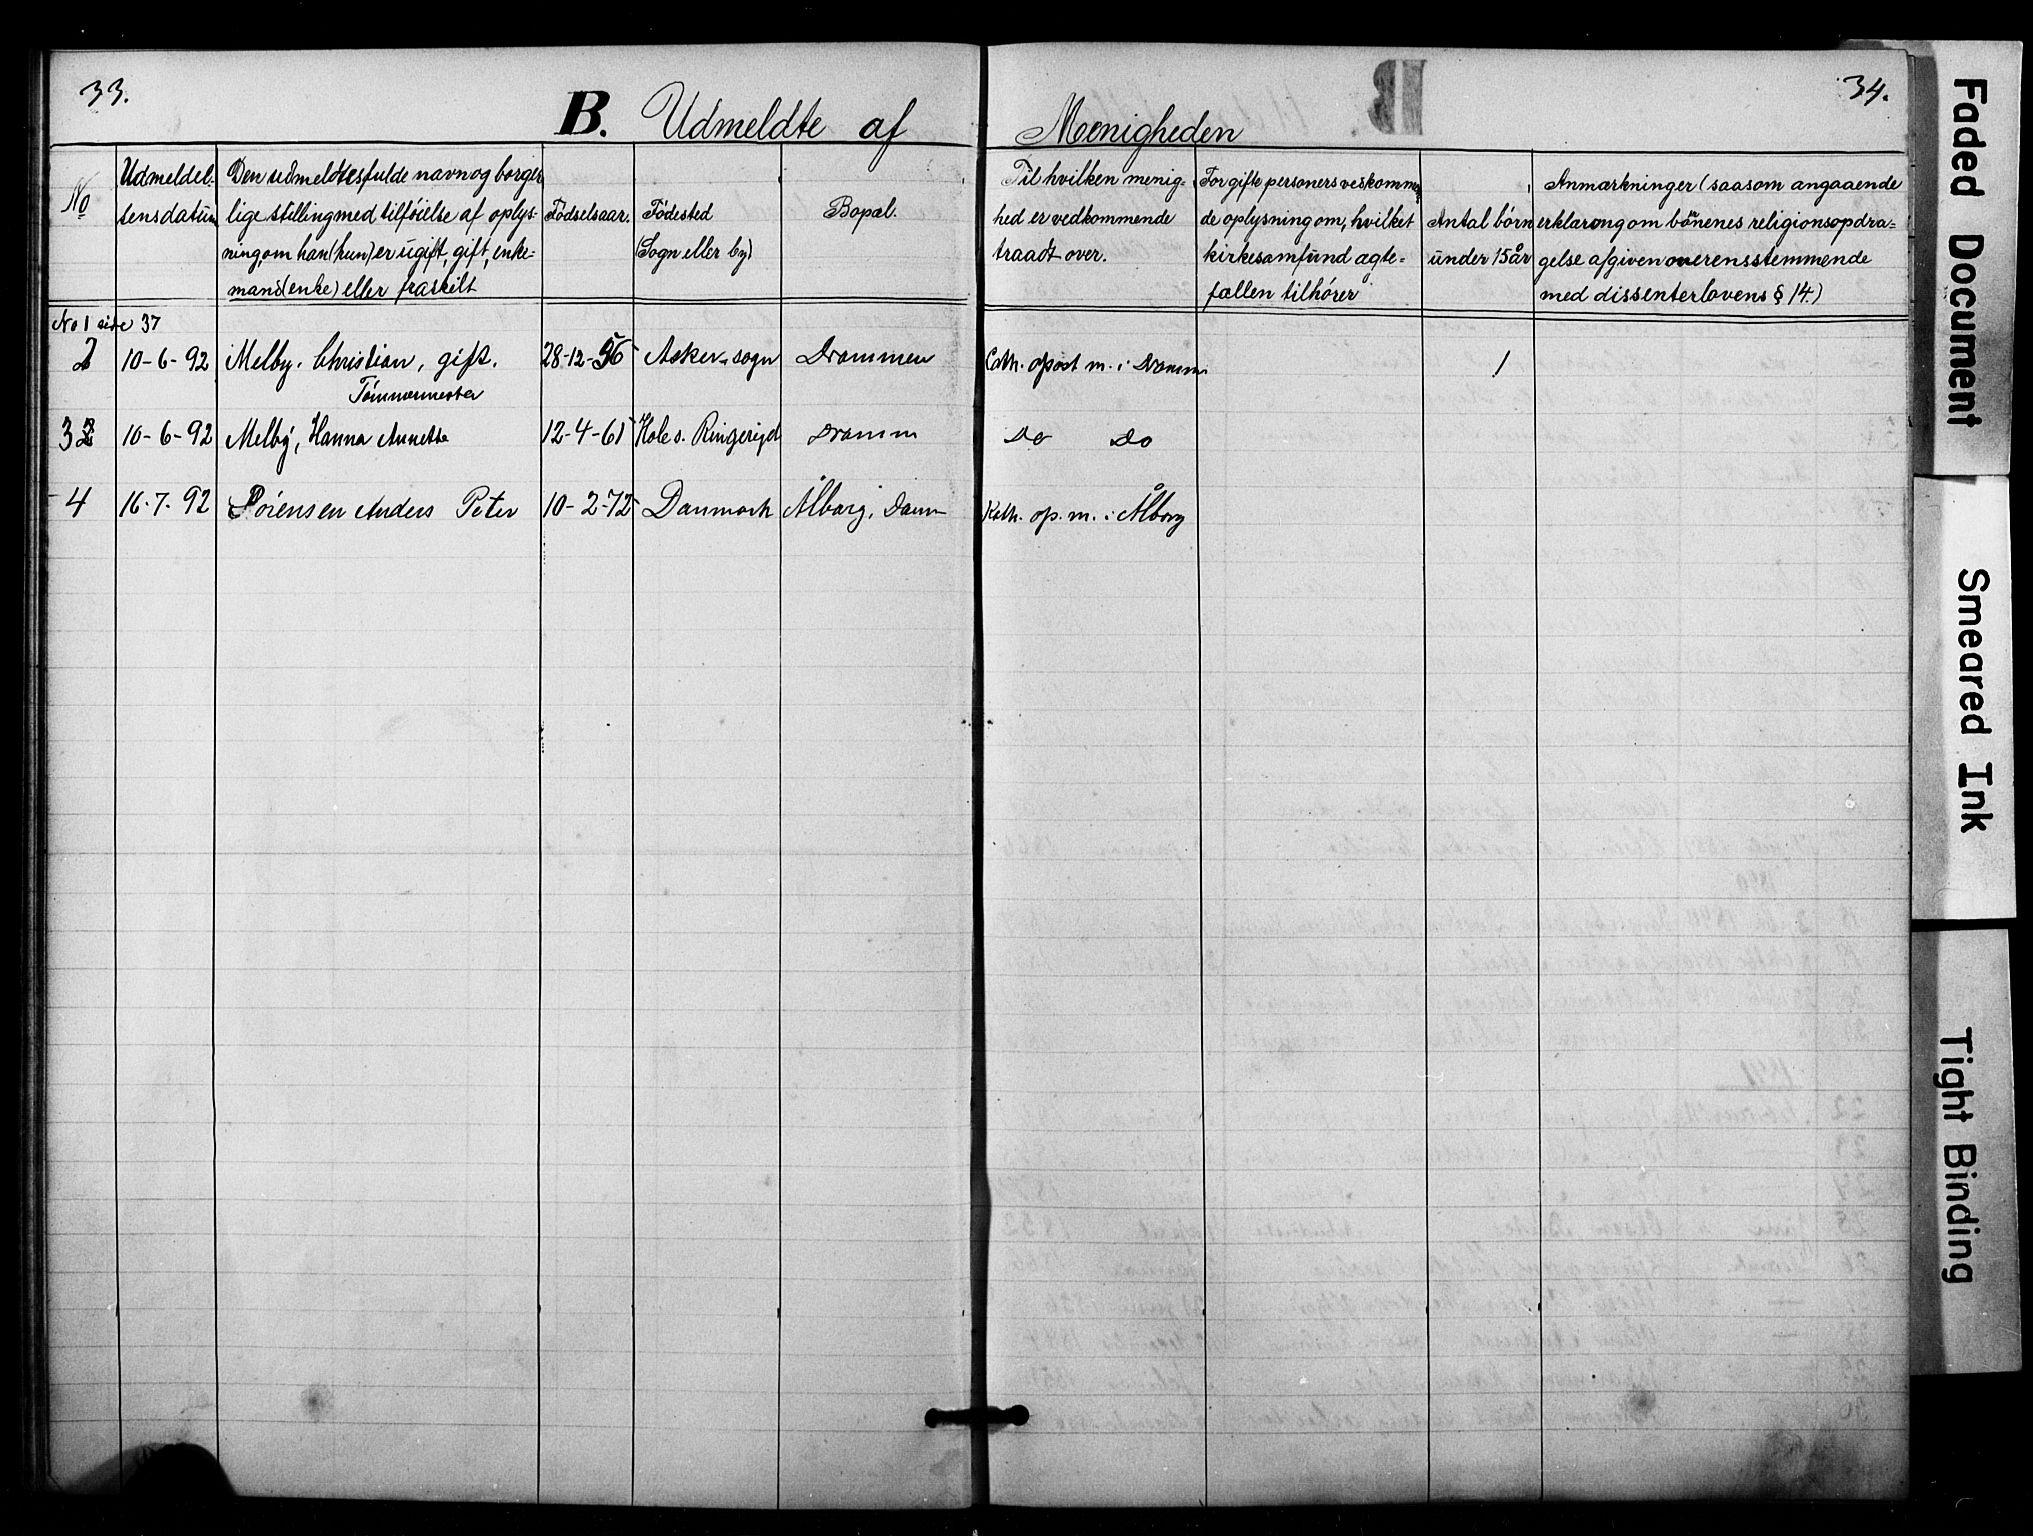 SAO, Den katolsk apostoliske menighet i Oslo , F/Fa/L0001: Dissenterprotokoll nr. 1, 1877-1891, s. 33-34